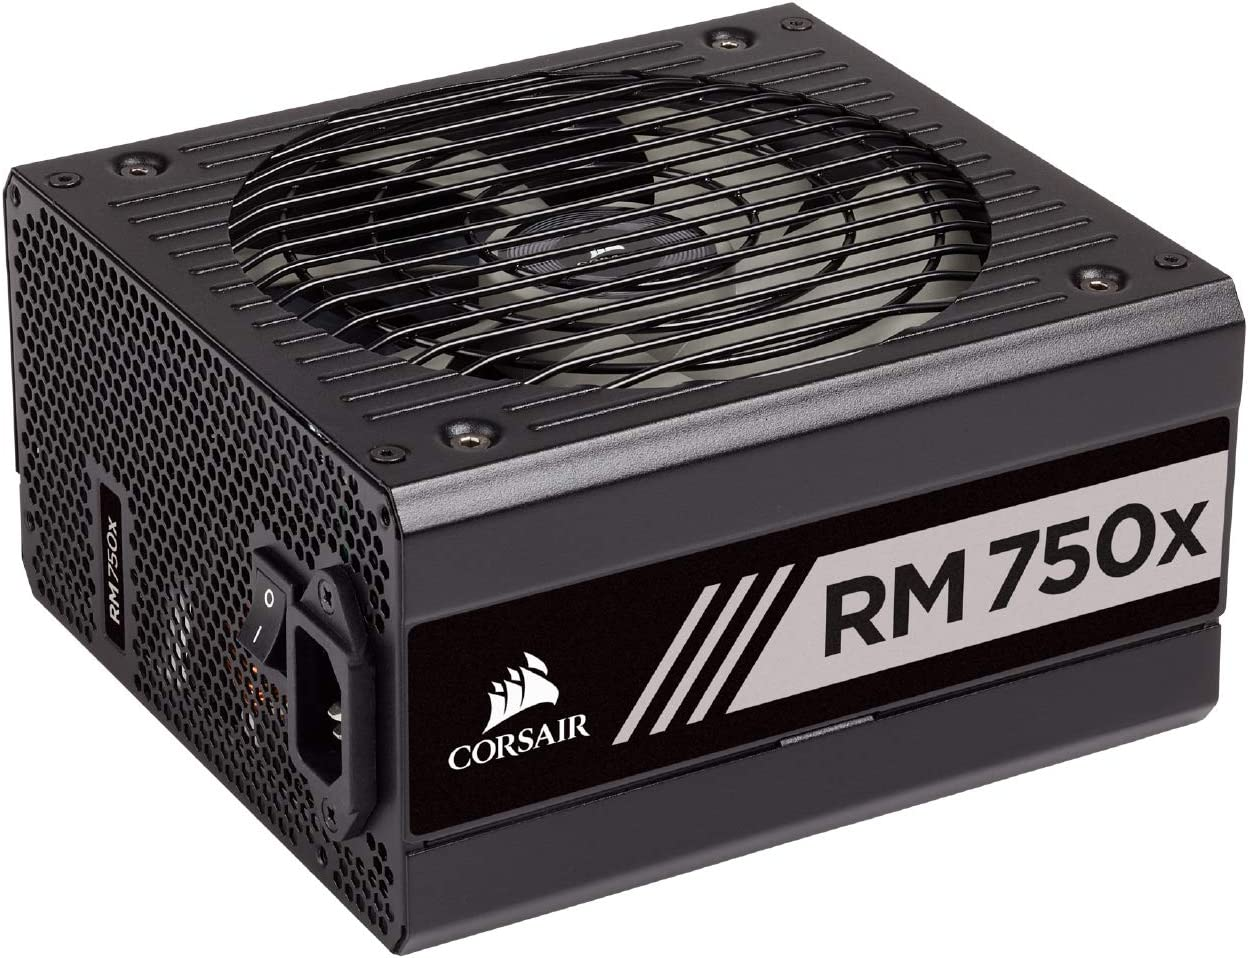 Corsair RM 750 vs RMX